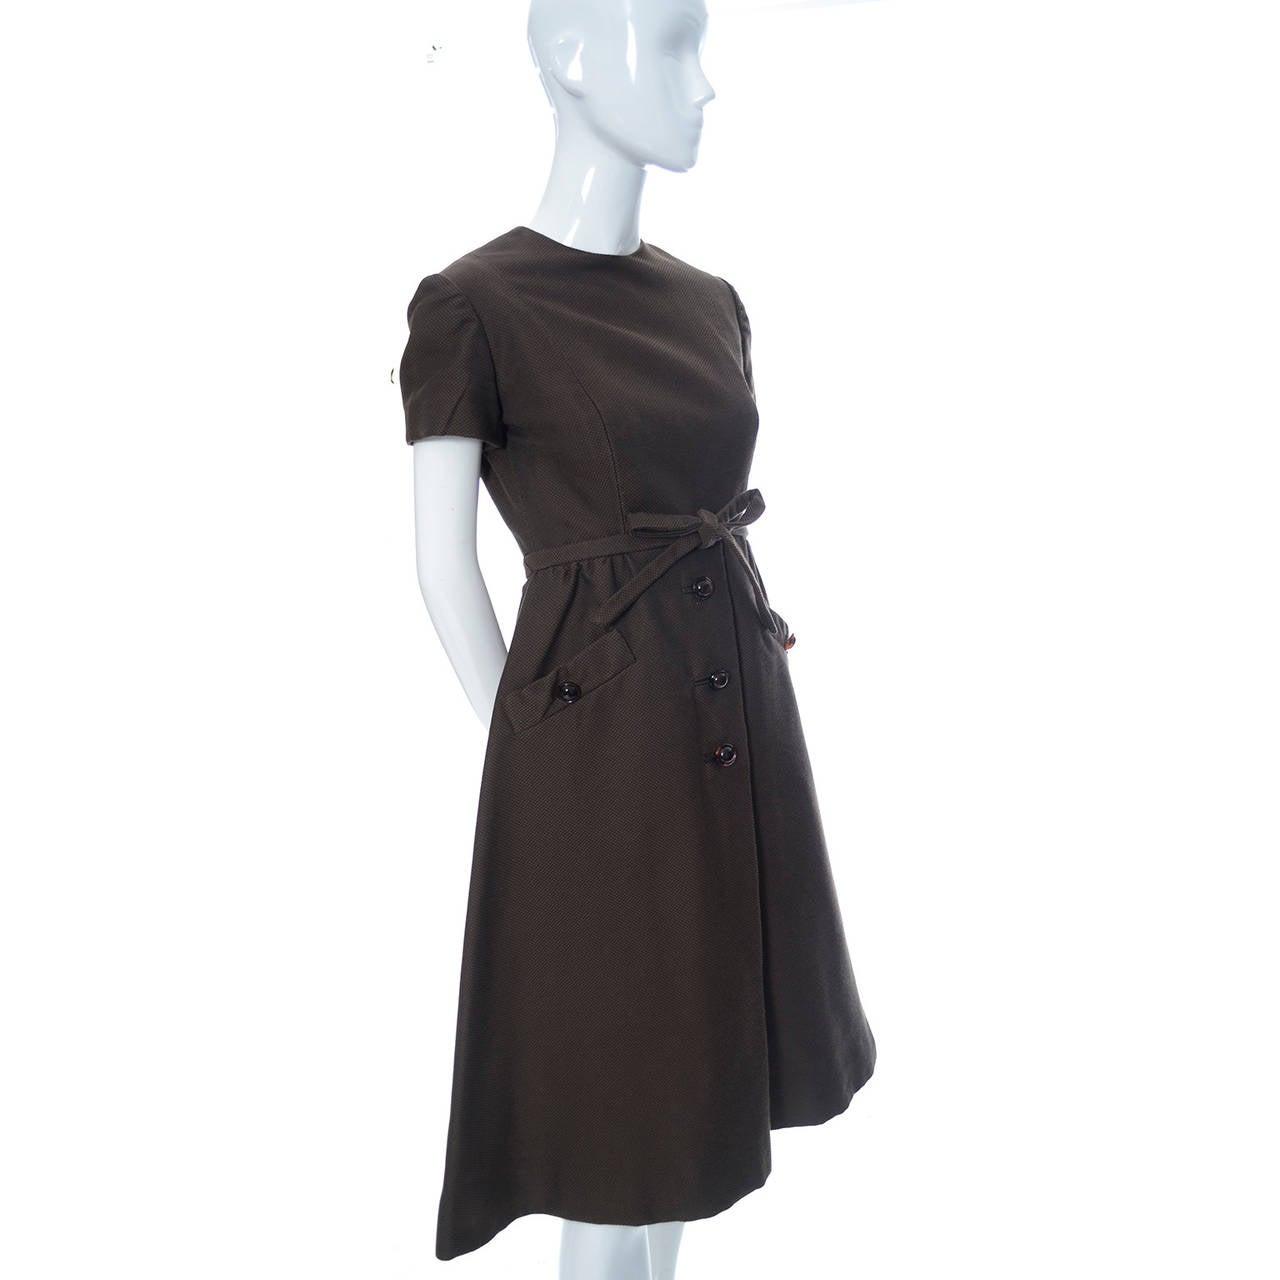 Women's Chocolate Brown Geoffrey Beene 1960s Mod Vintage Dress Pockets Belt For Sale